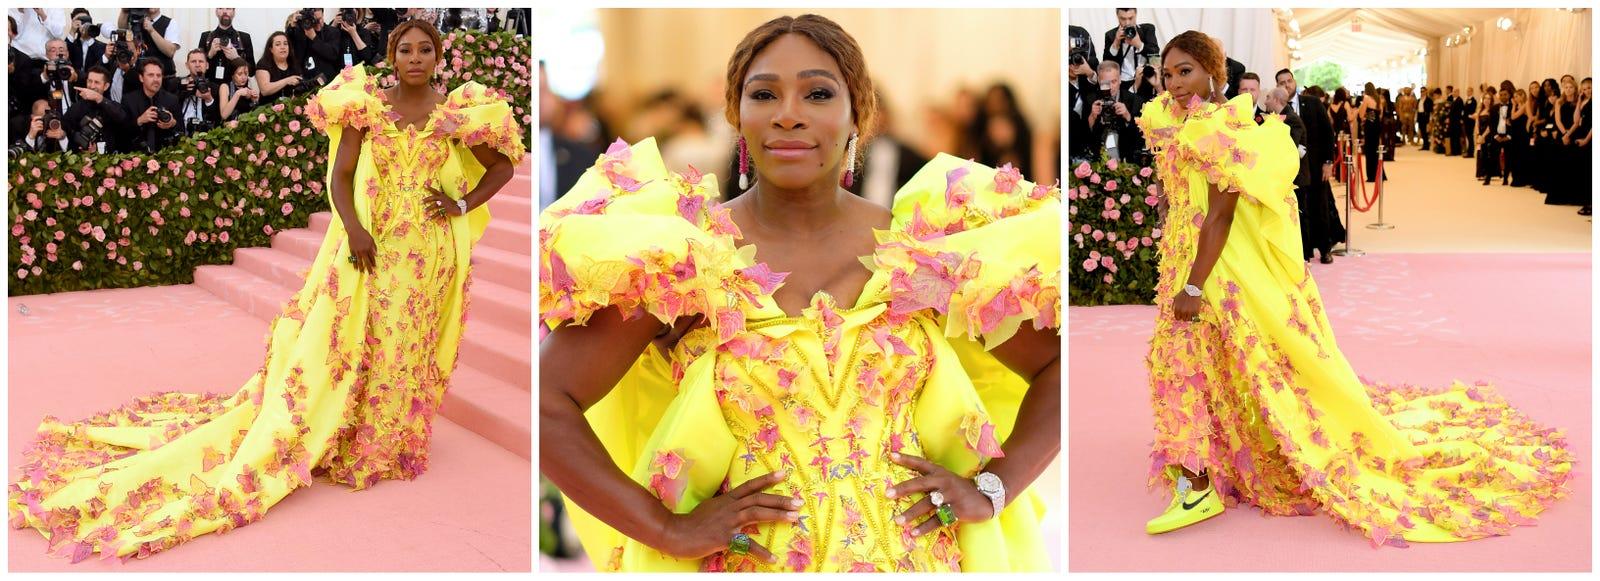 Serena Williams in Versace